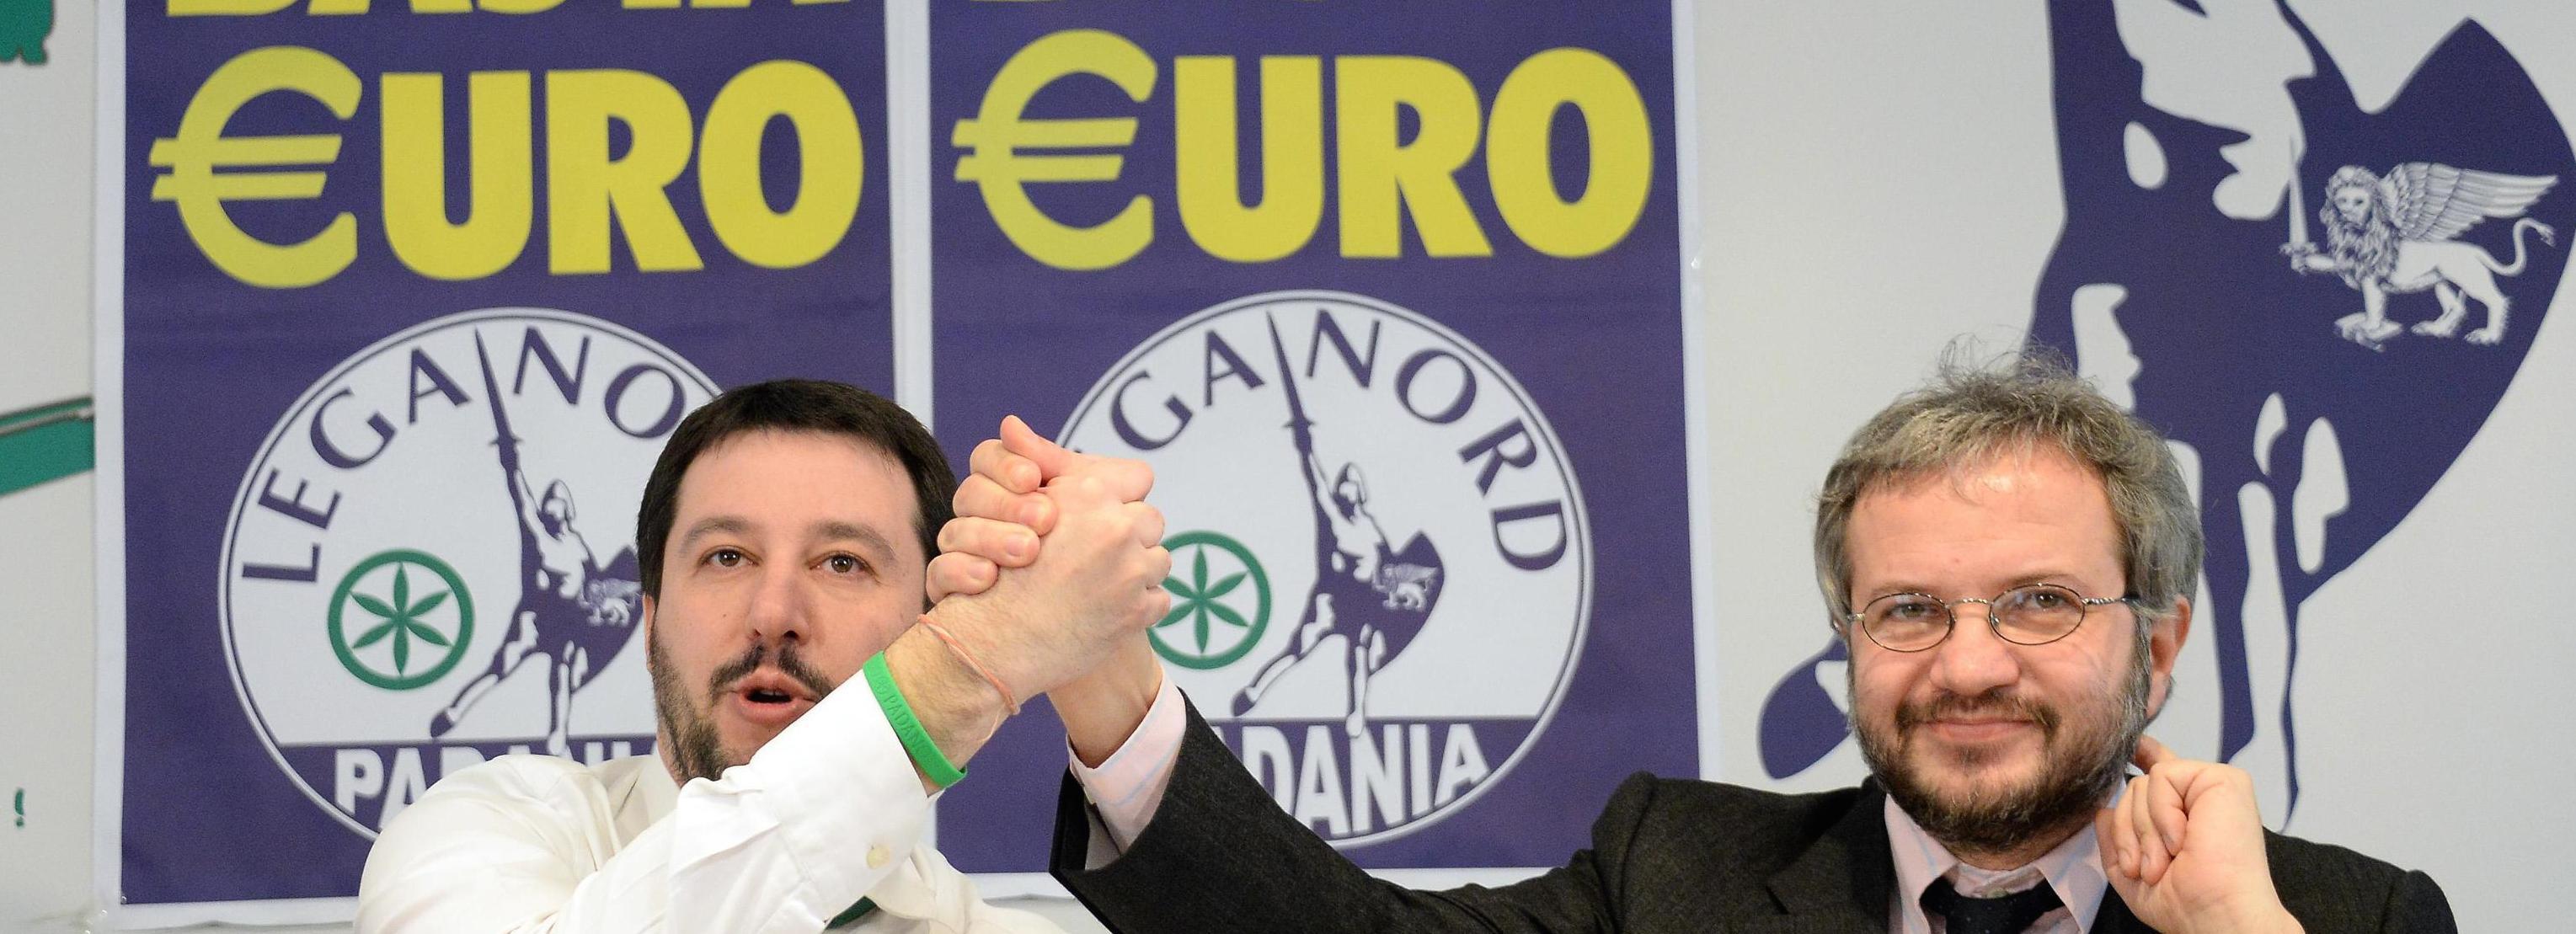 L'economista Claudio Borghi con Matteo Salvini